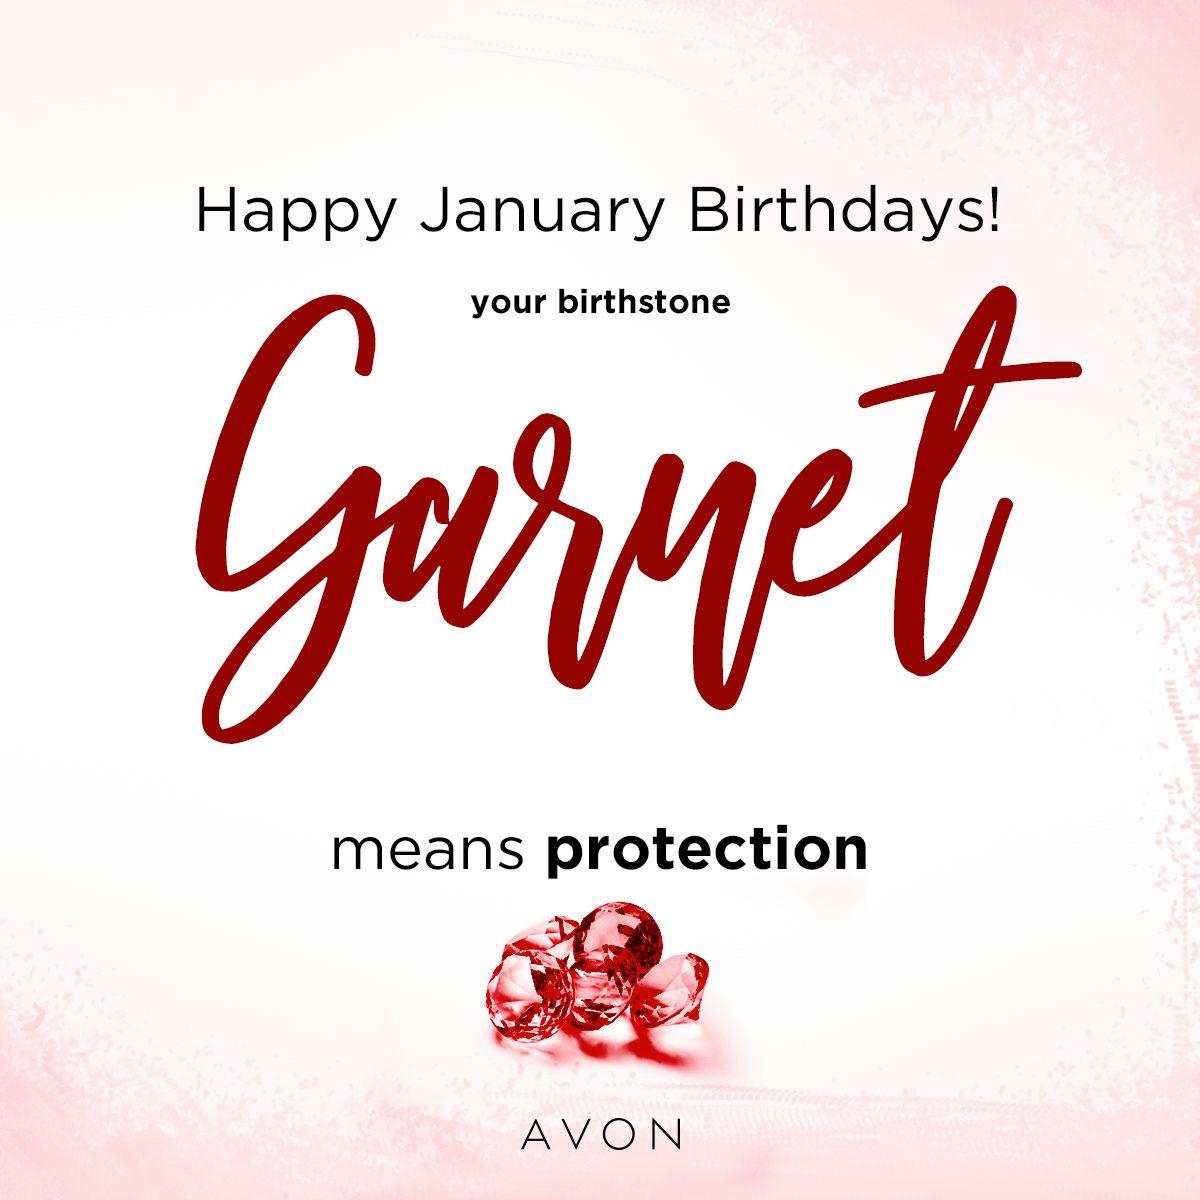 Online Brochure by in 2020 Avon, Its my birthday month